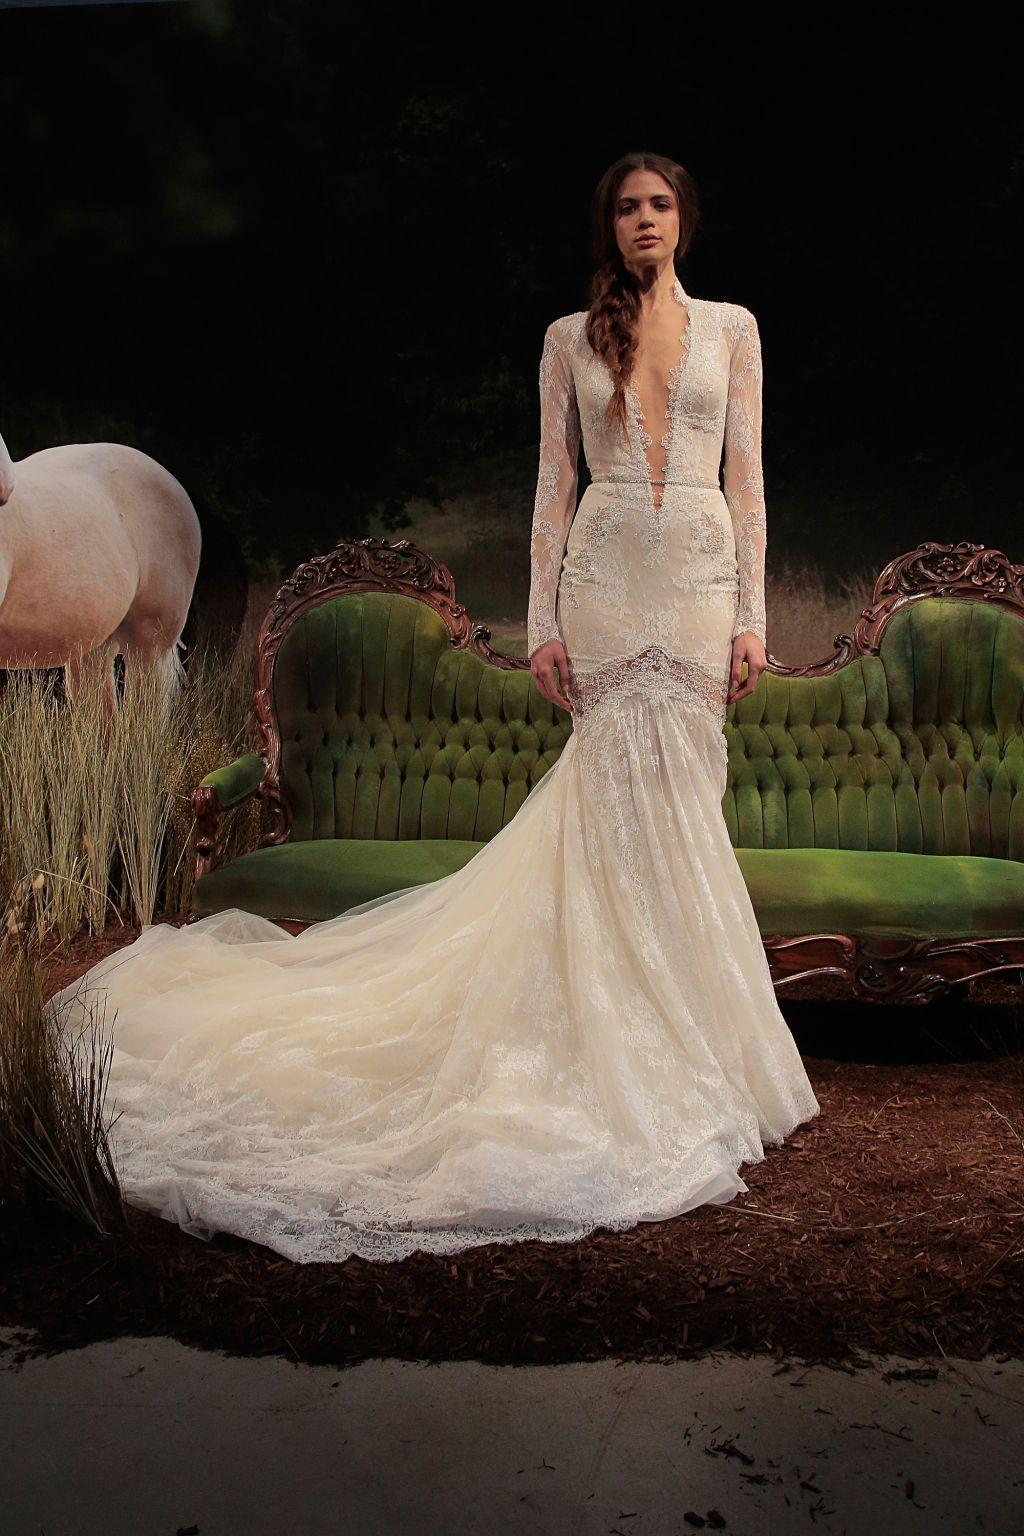 Royal themed wedding dresses  Galia Lahav Spring  Wedding Dresses ucLe Secret Royalud Couture